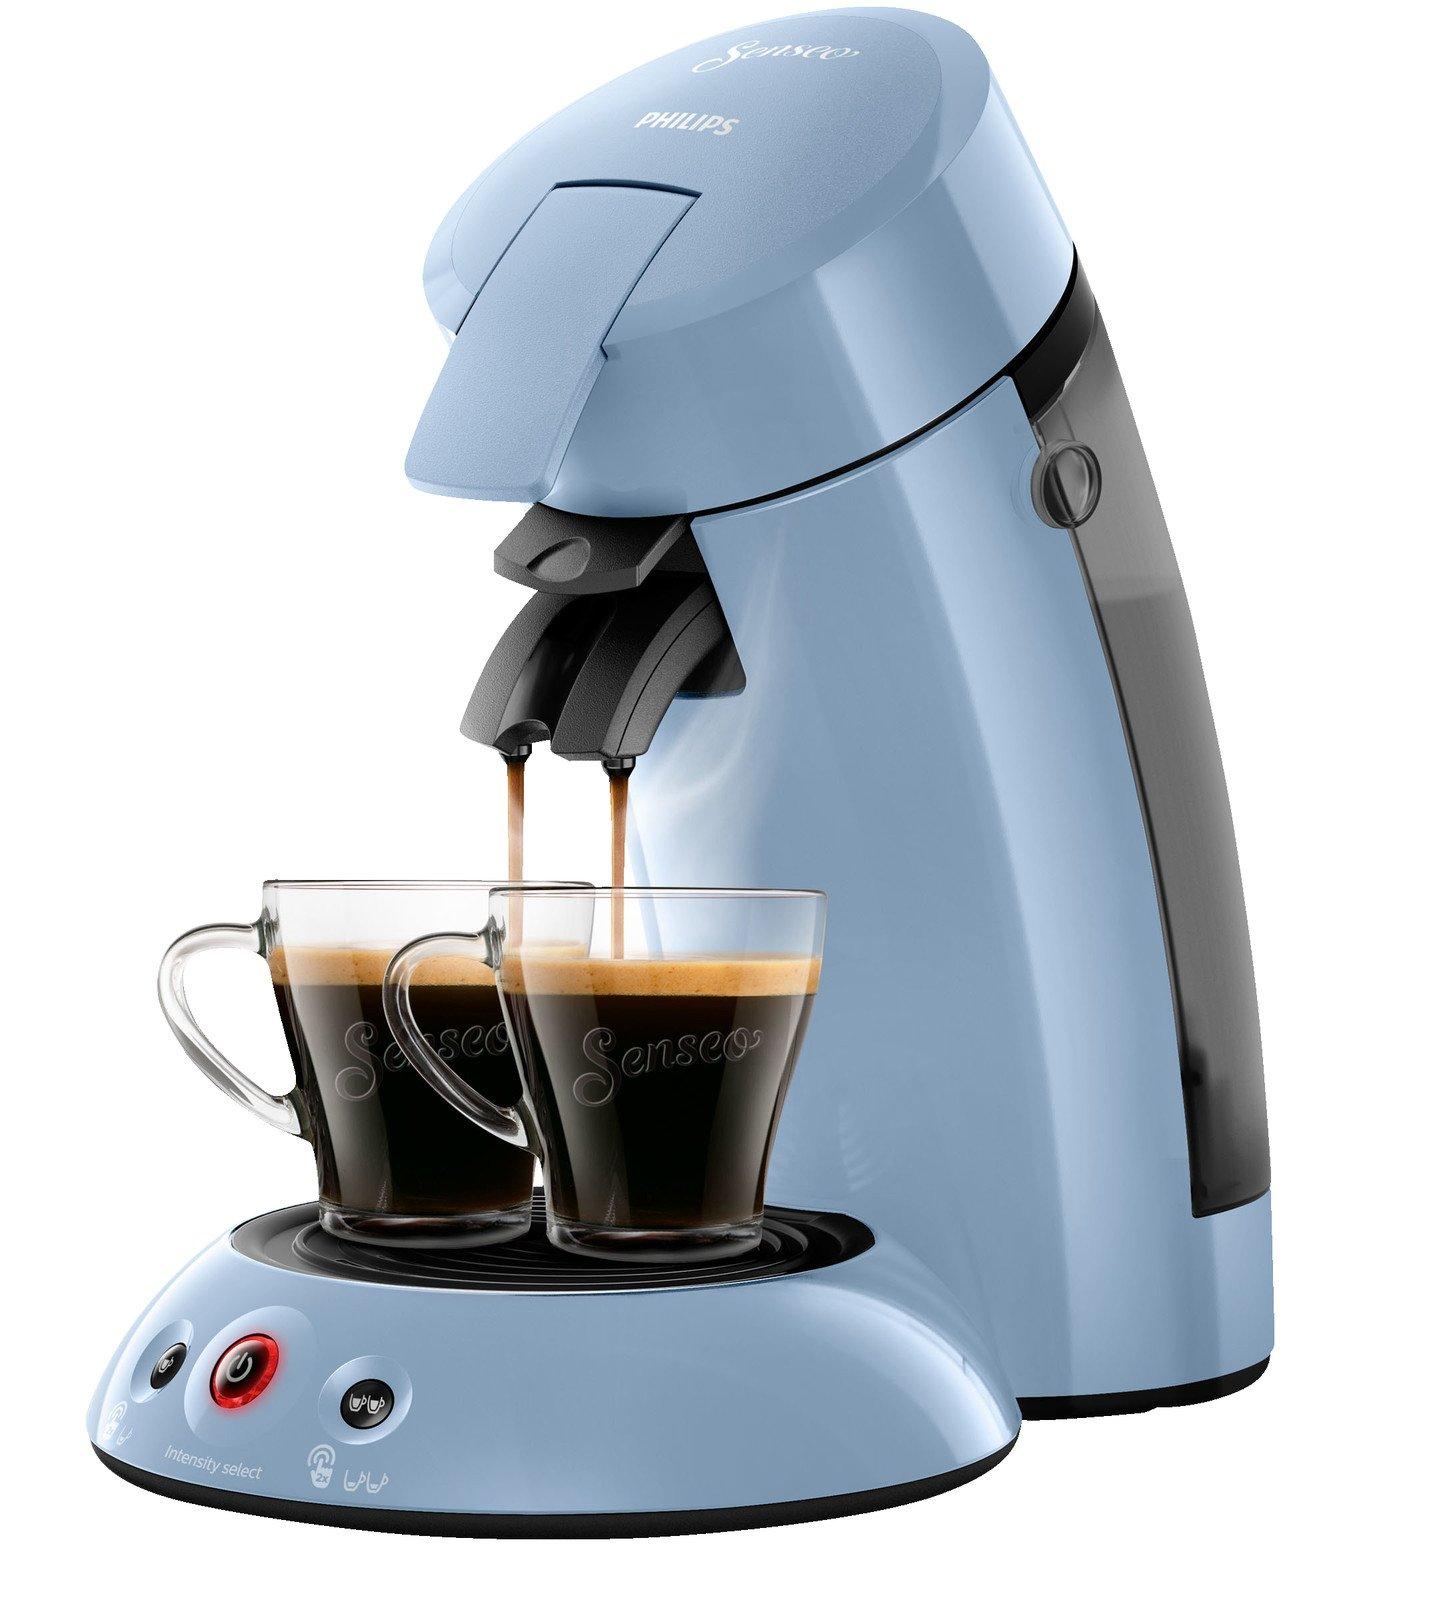 PHILIPS Original Senseo HD6554//70 Kaffeepadmaschine hellblau 1450 Watt